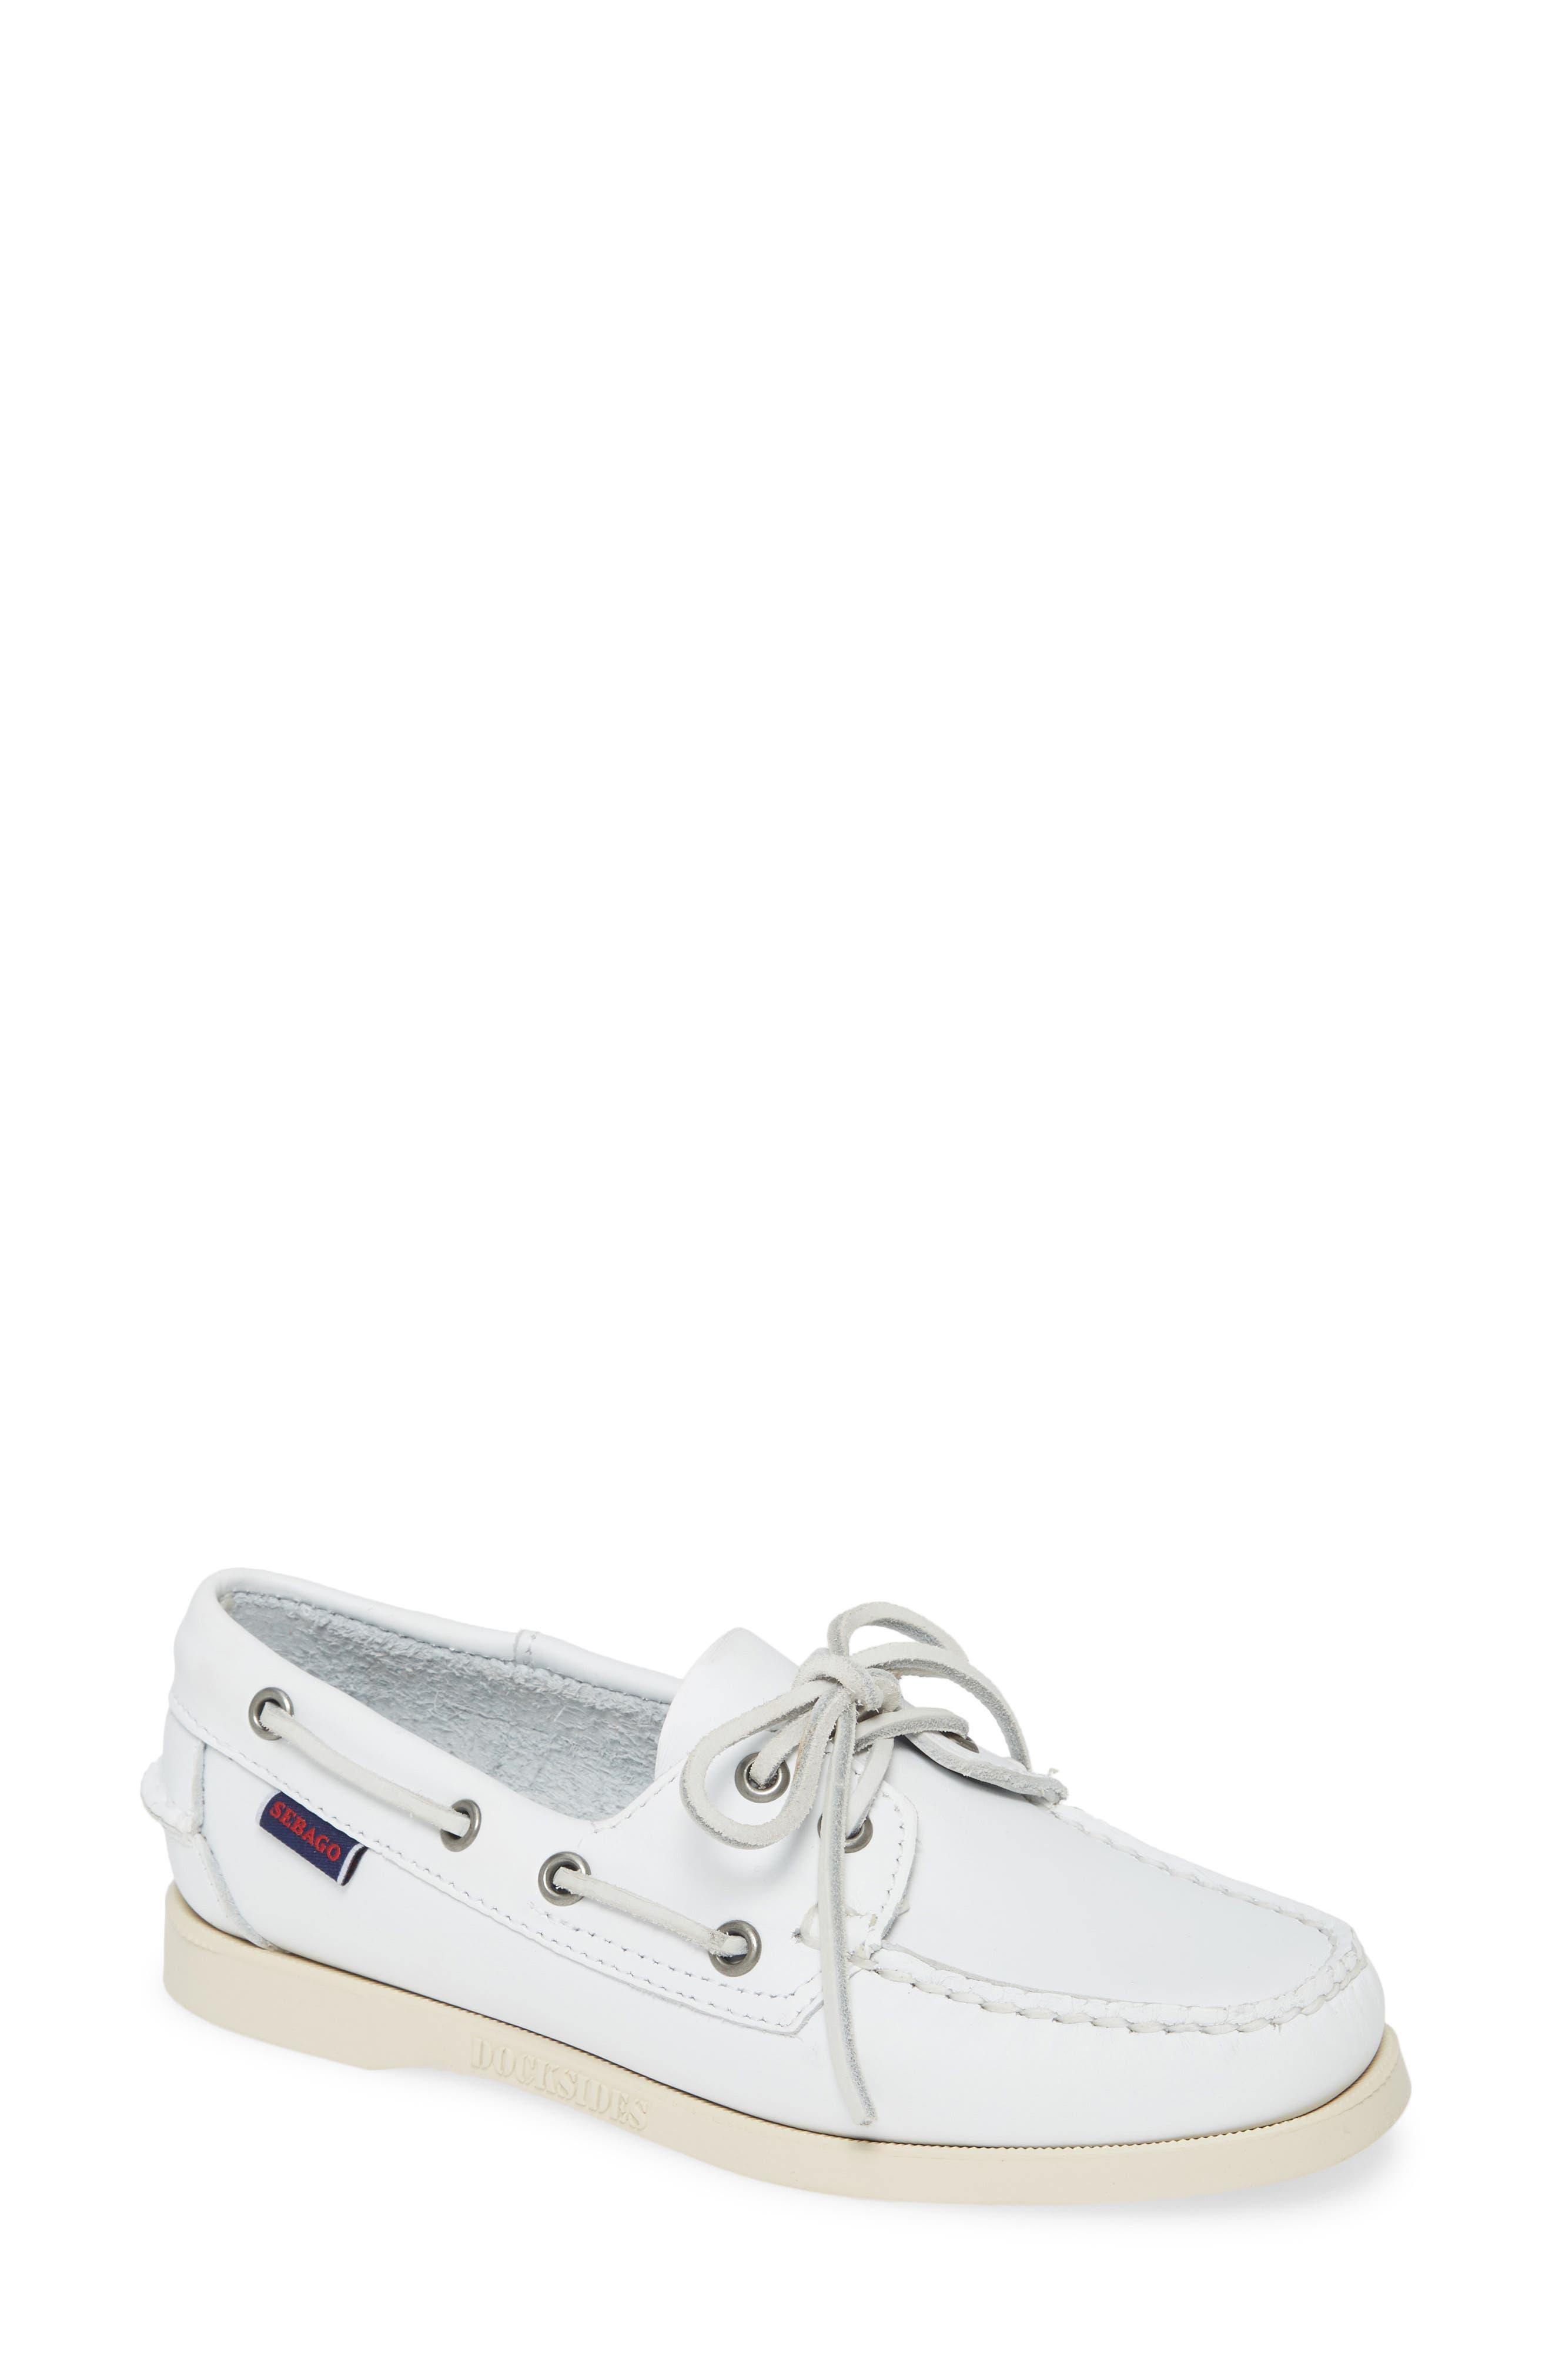 Women's Sebago Shoes Sale   Nordstrom